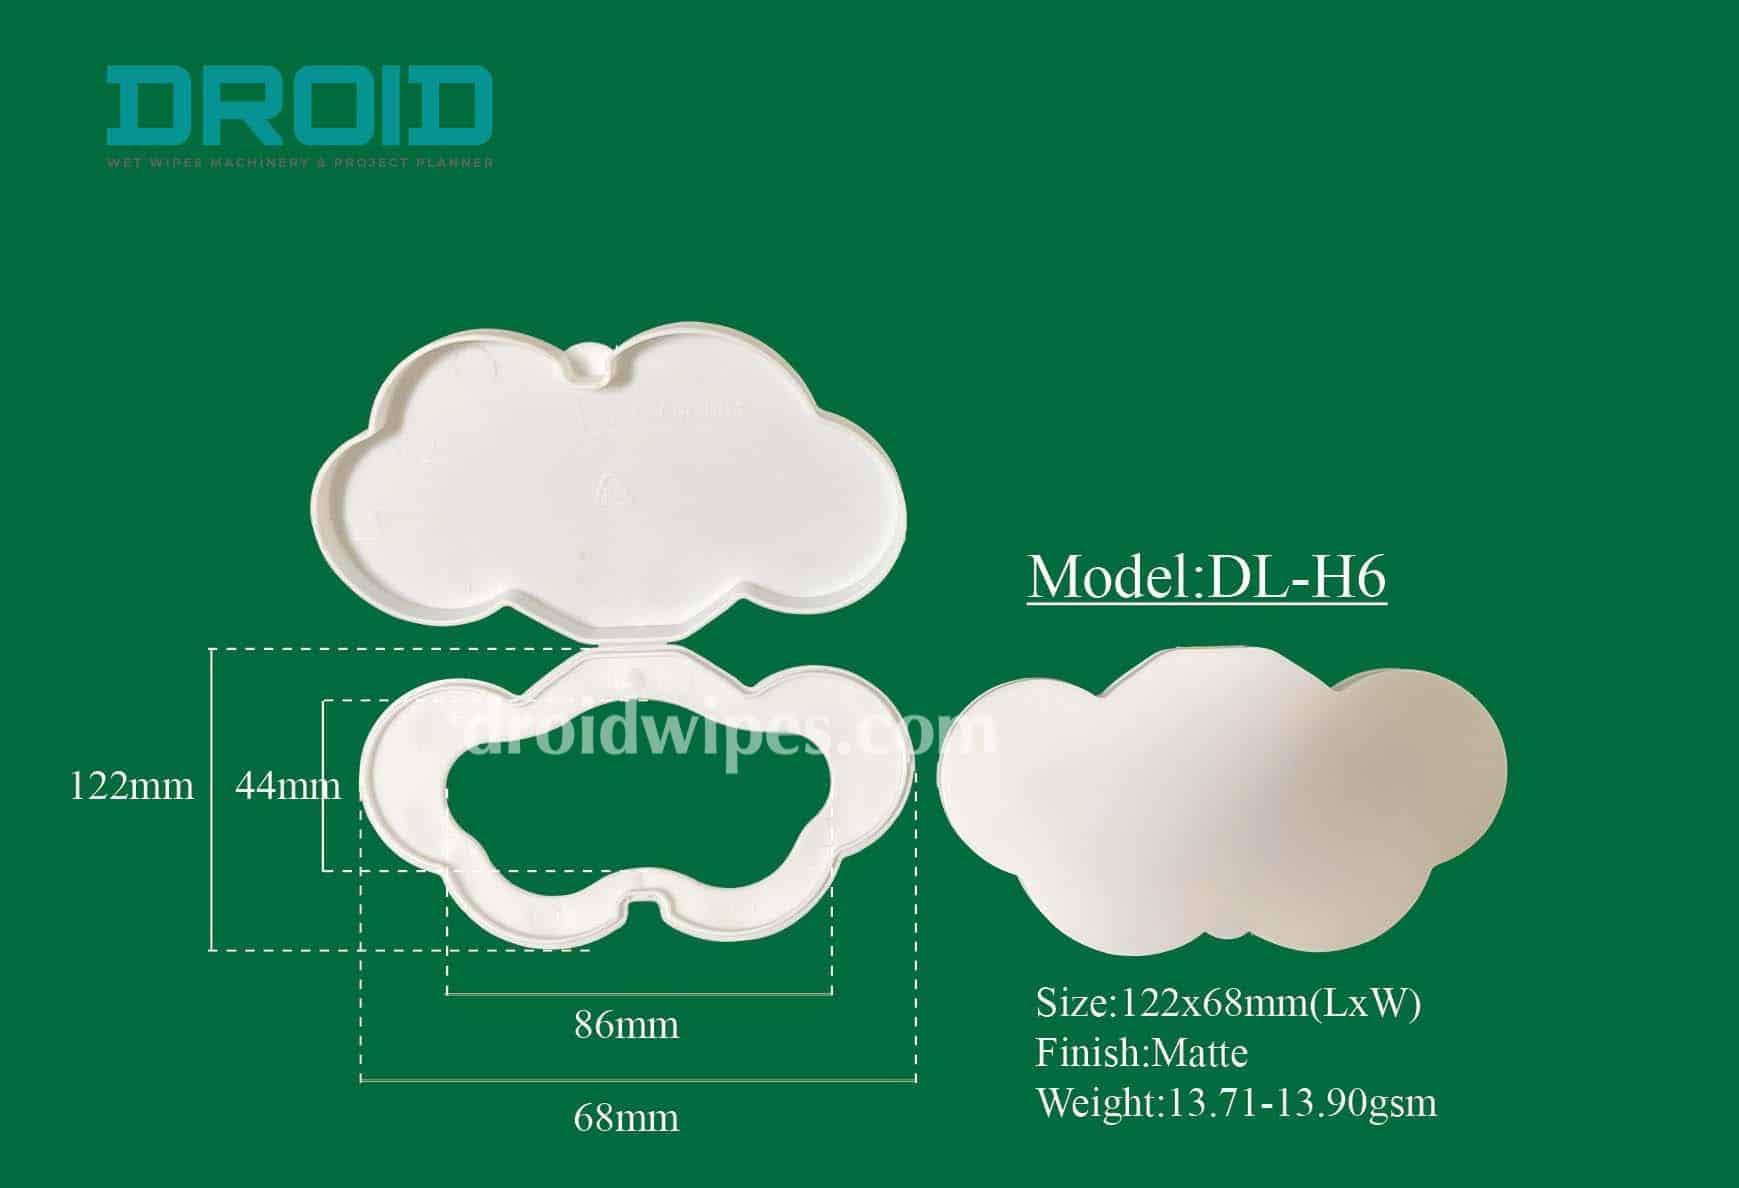 Plastic lid for wet wipes 5 - Plastic Lid for Wet Wipes